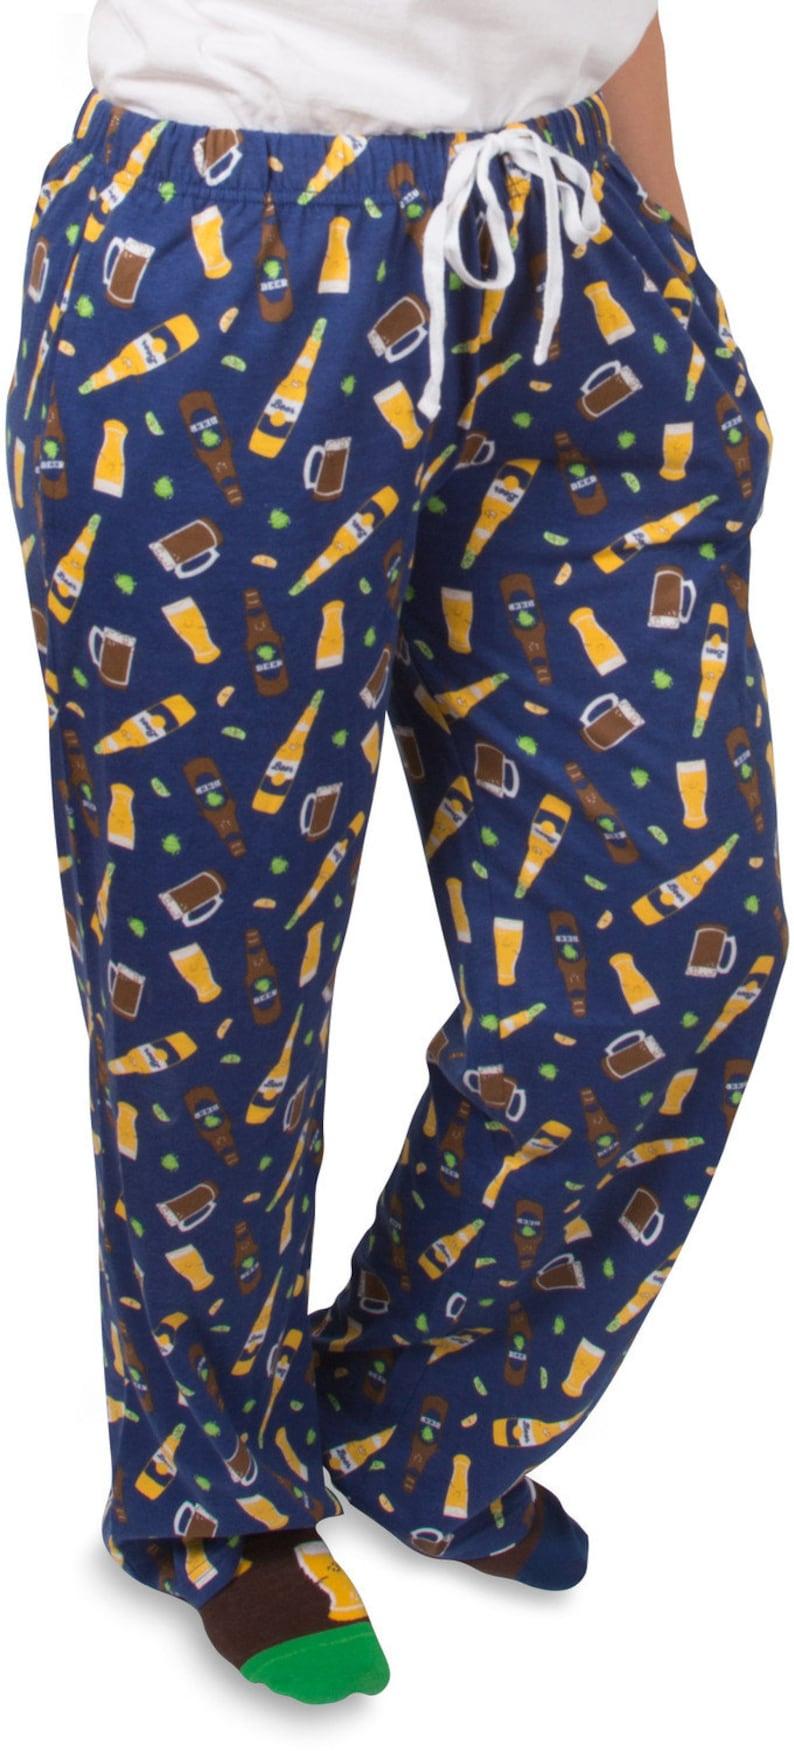 Beer  FUNNY  Mens  Womens  Pajama Bottoms  Pajama Pants  image 0